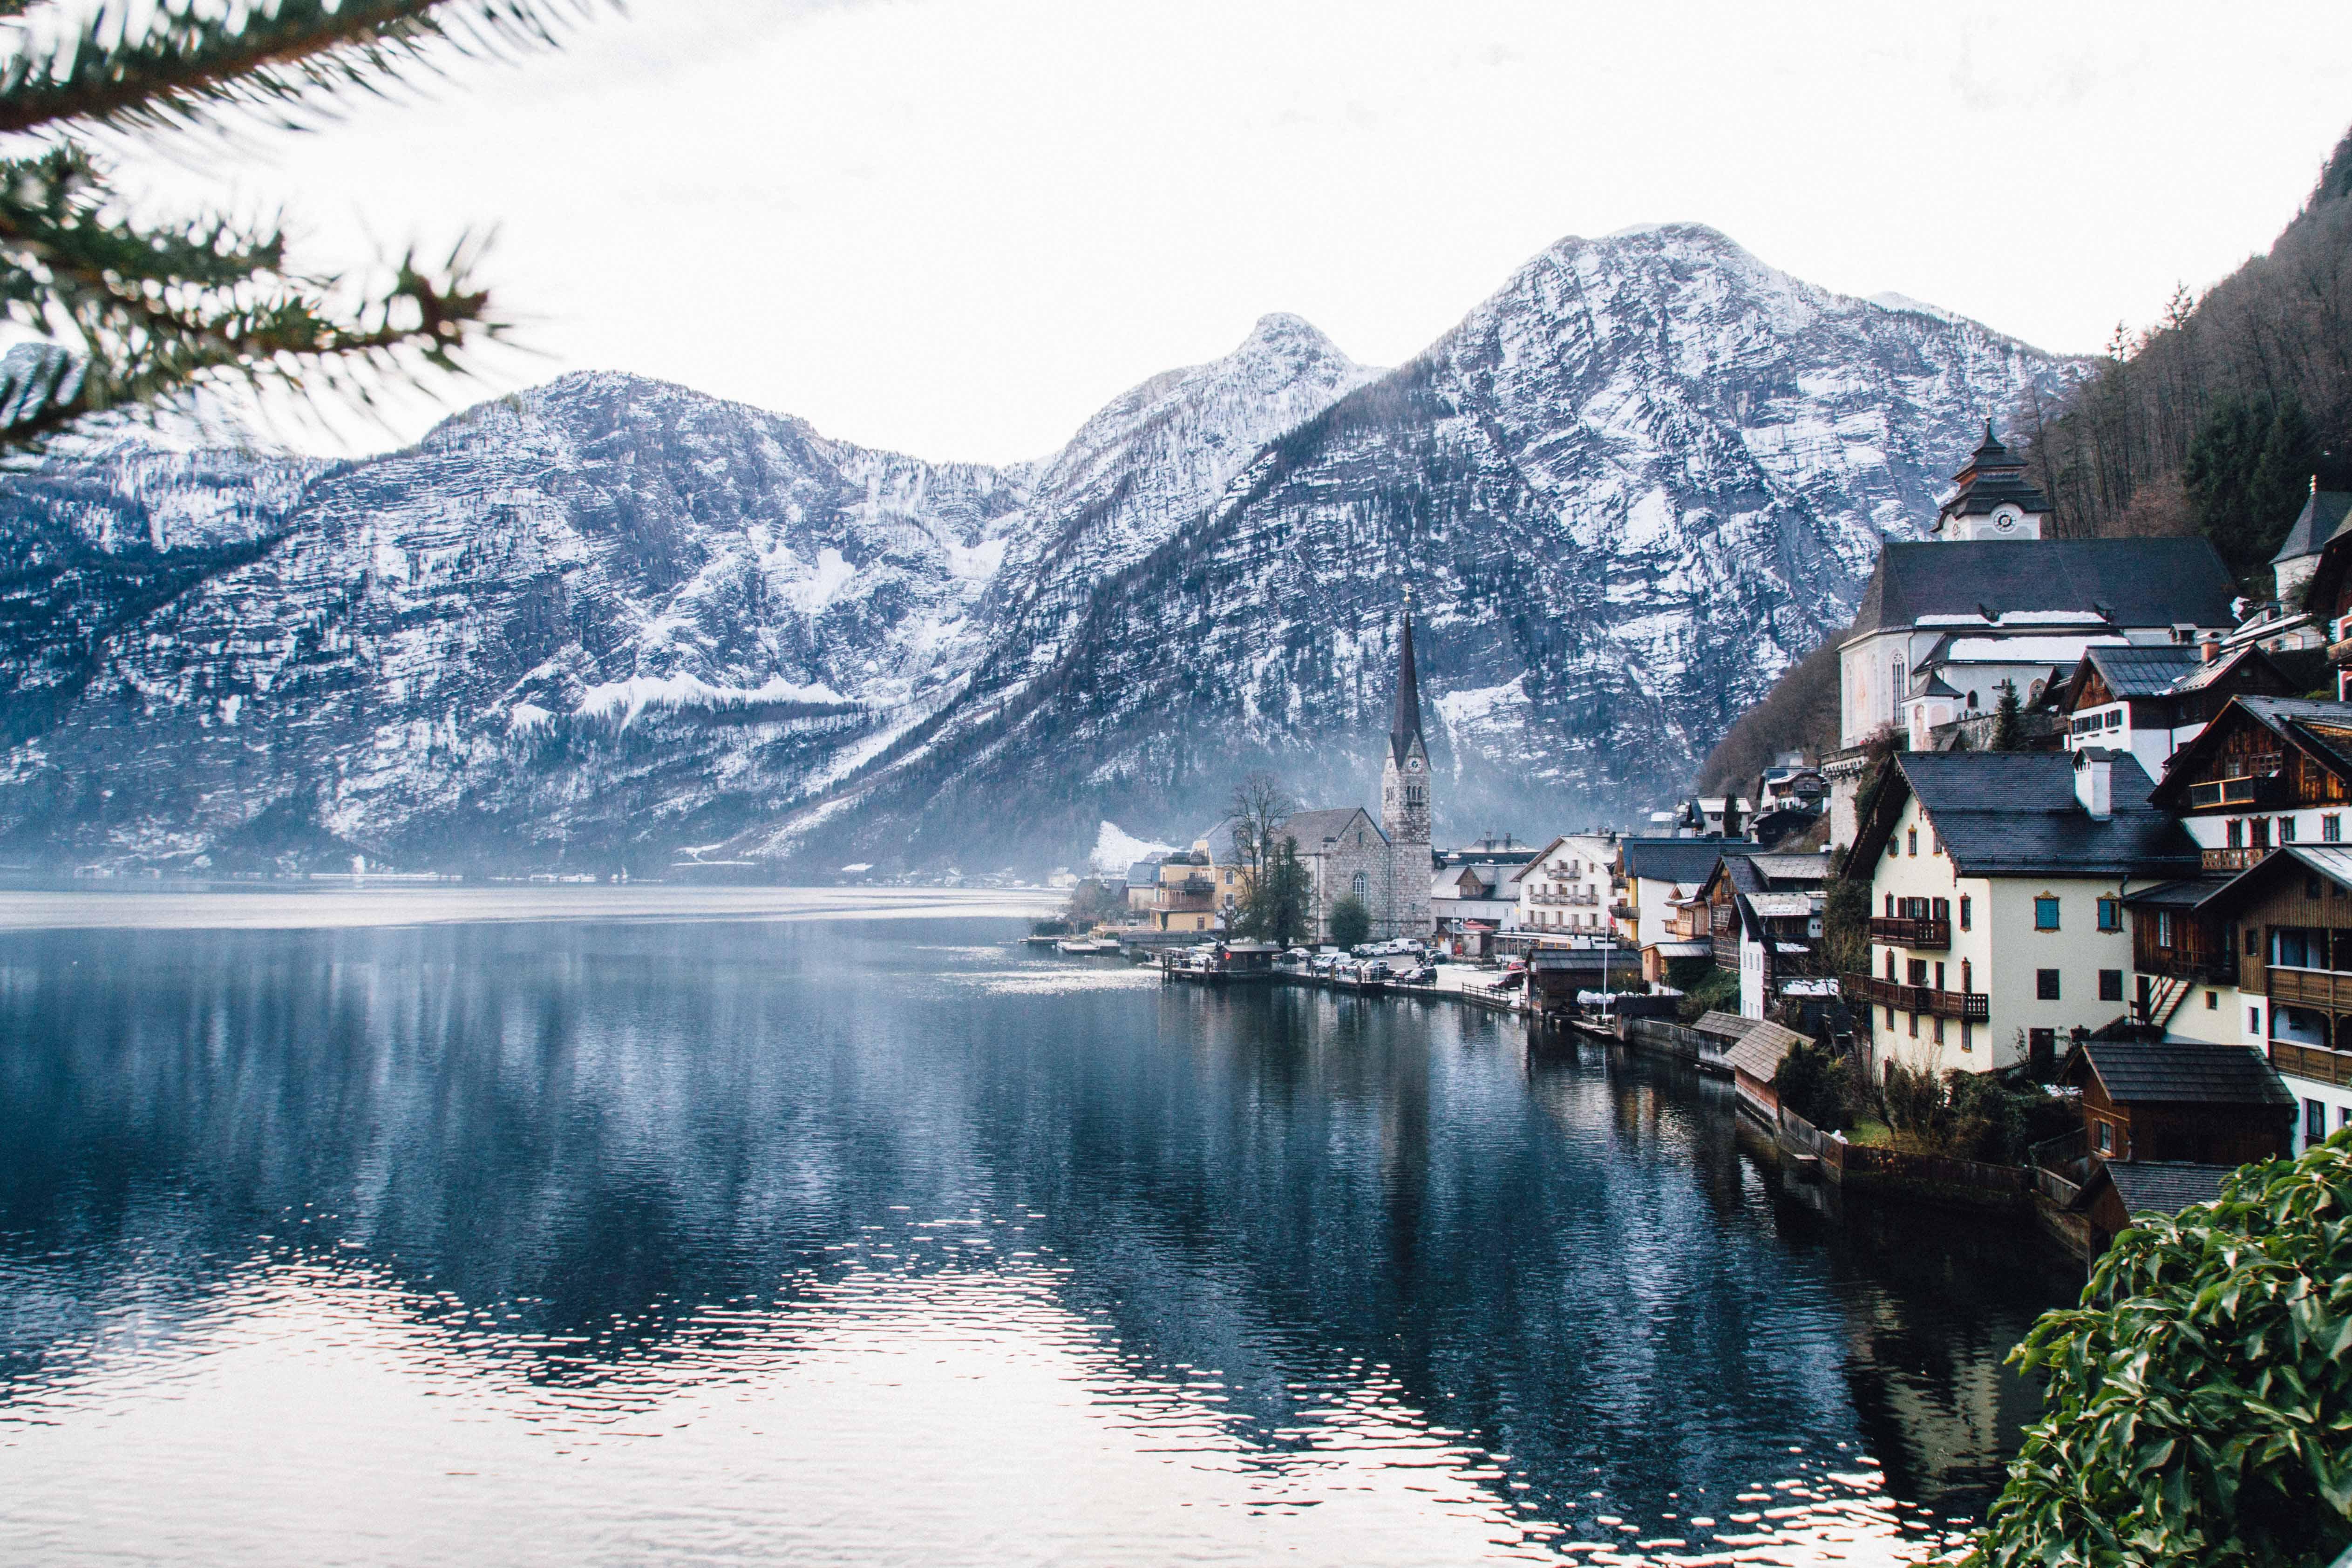 svizzera-denis-torri-pil-suiza